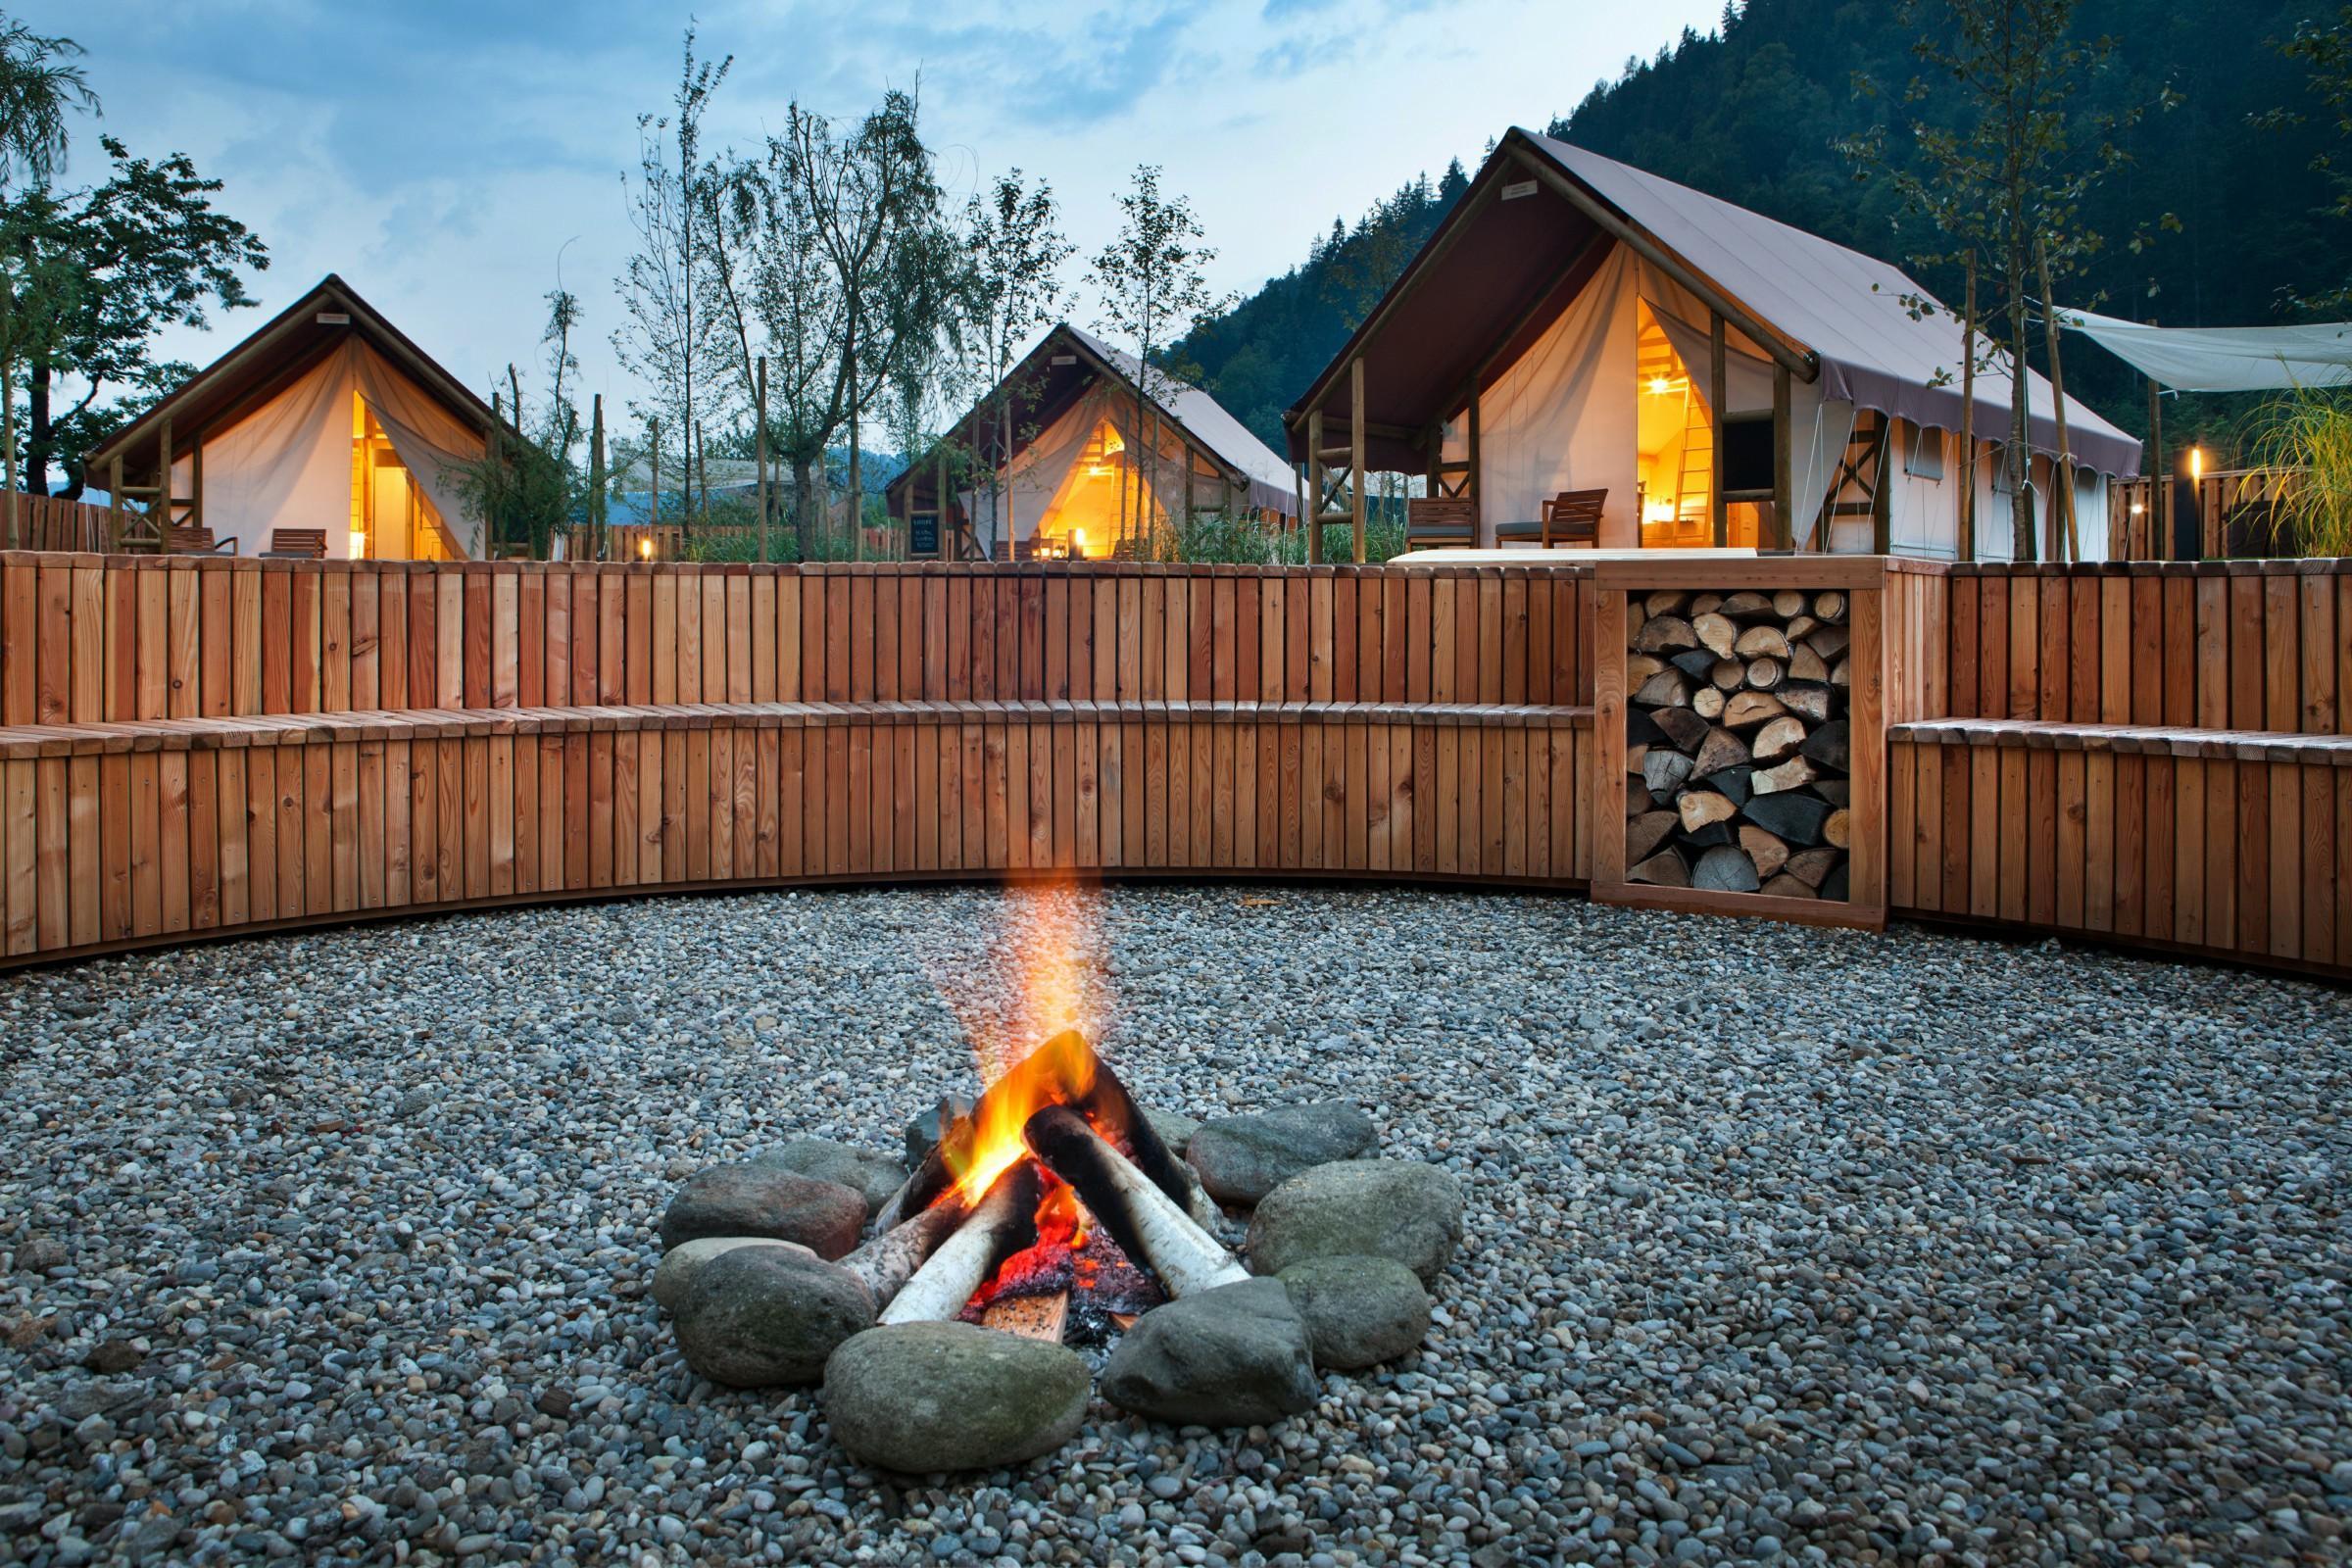 FormatFactoryCharming Herbal- Ob ognju, foto Jost Gantar, Savinja Alps